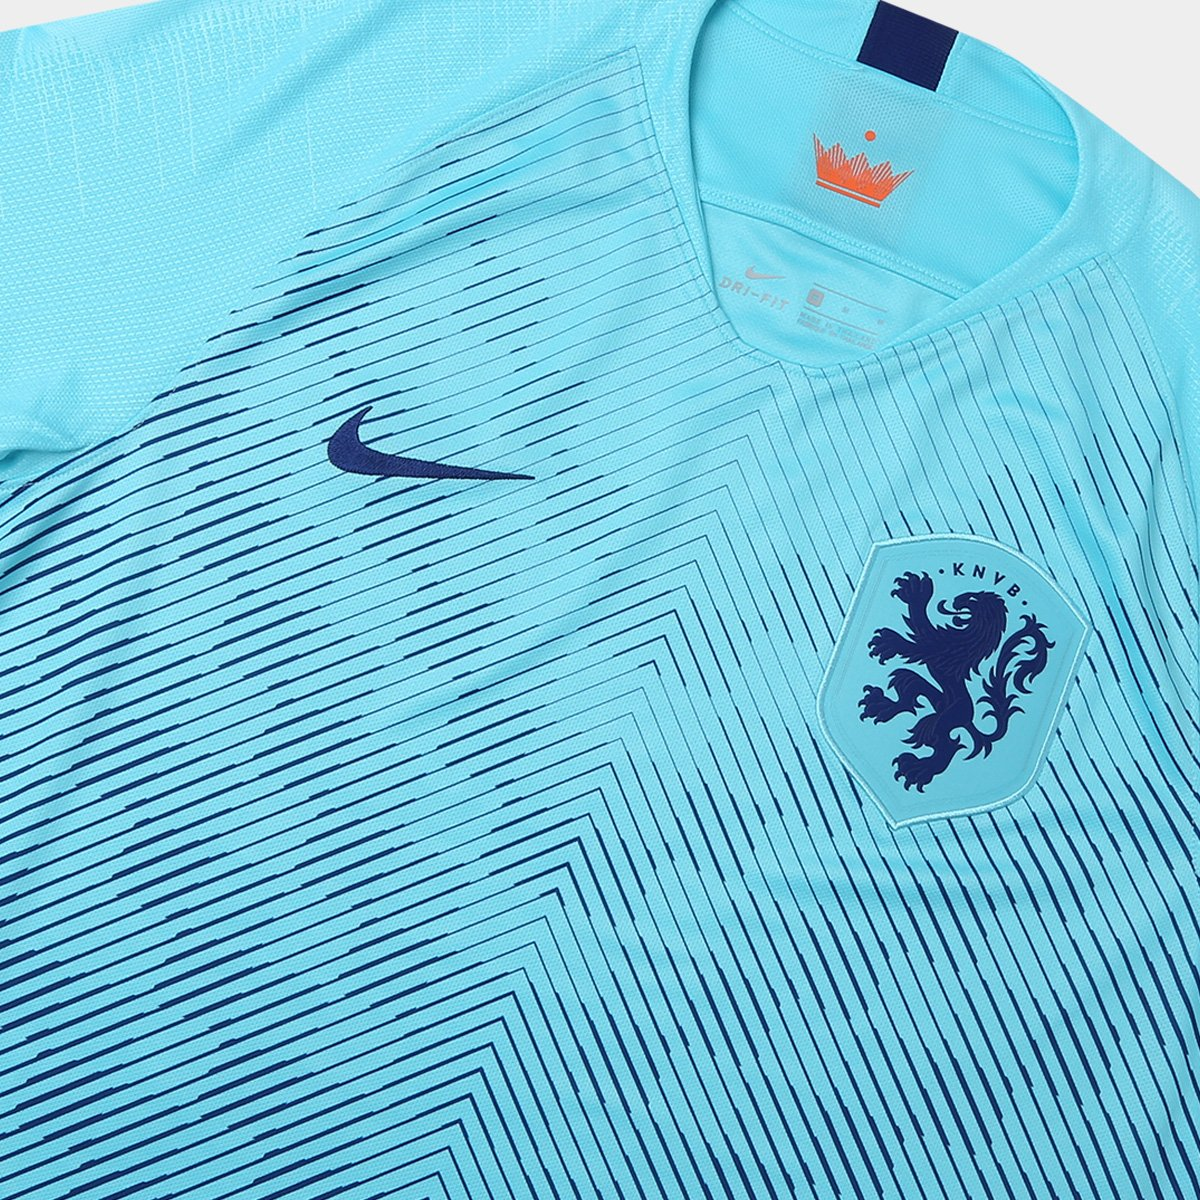 b128af3445 Camisa Seleção Holanda Away 2018 s n° Torcedor Nike Masculina ...